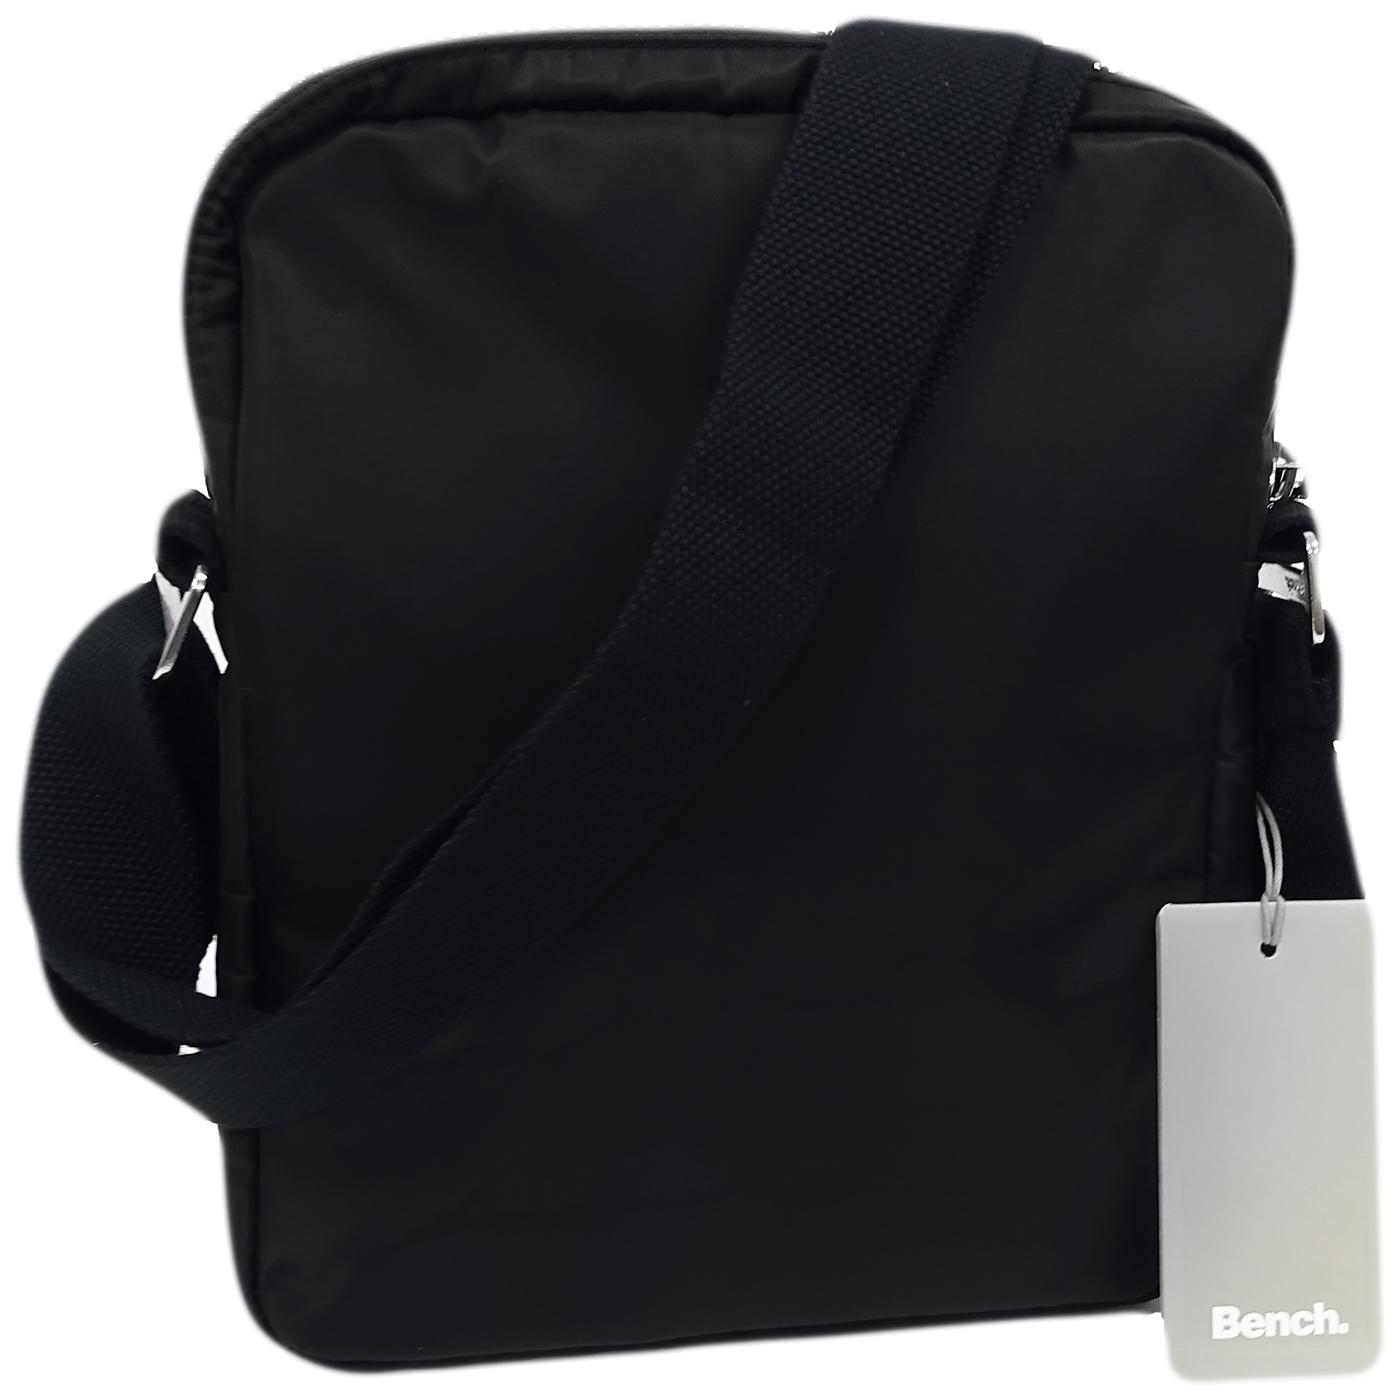 Bench Small Side Bag / Man Bag - 0840 | eBay